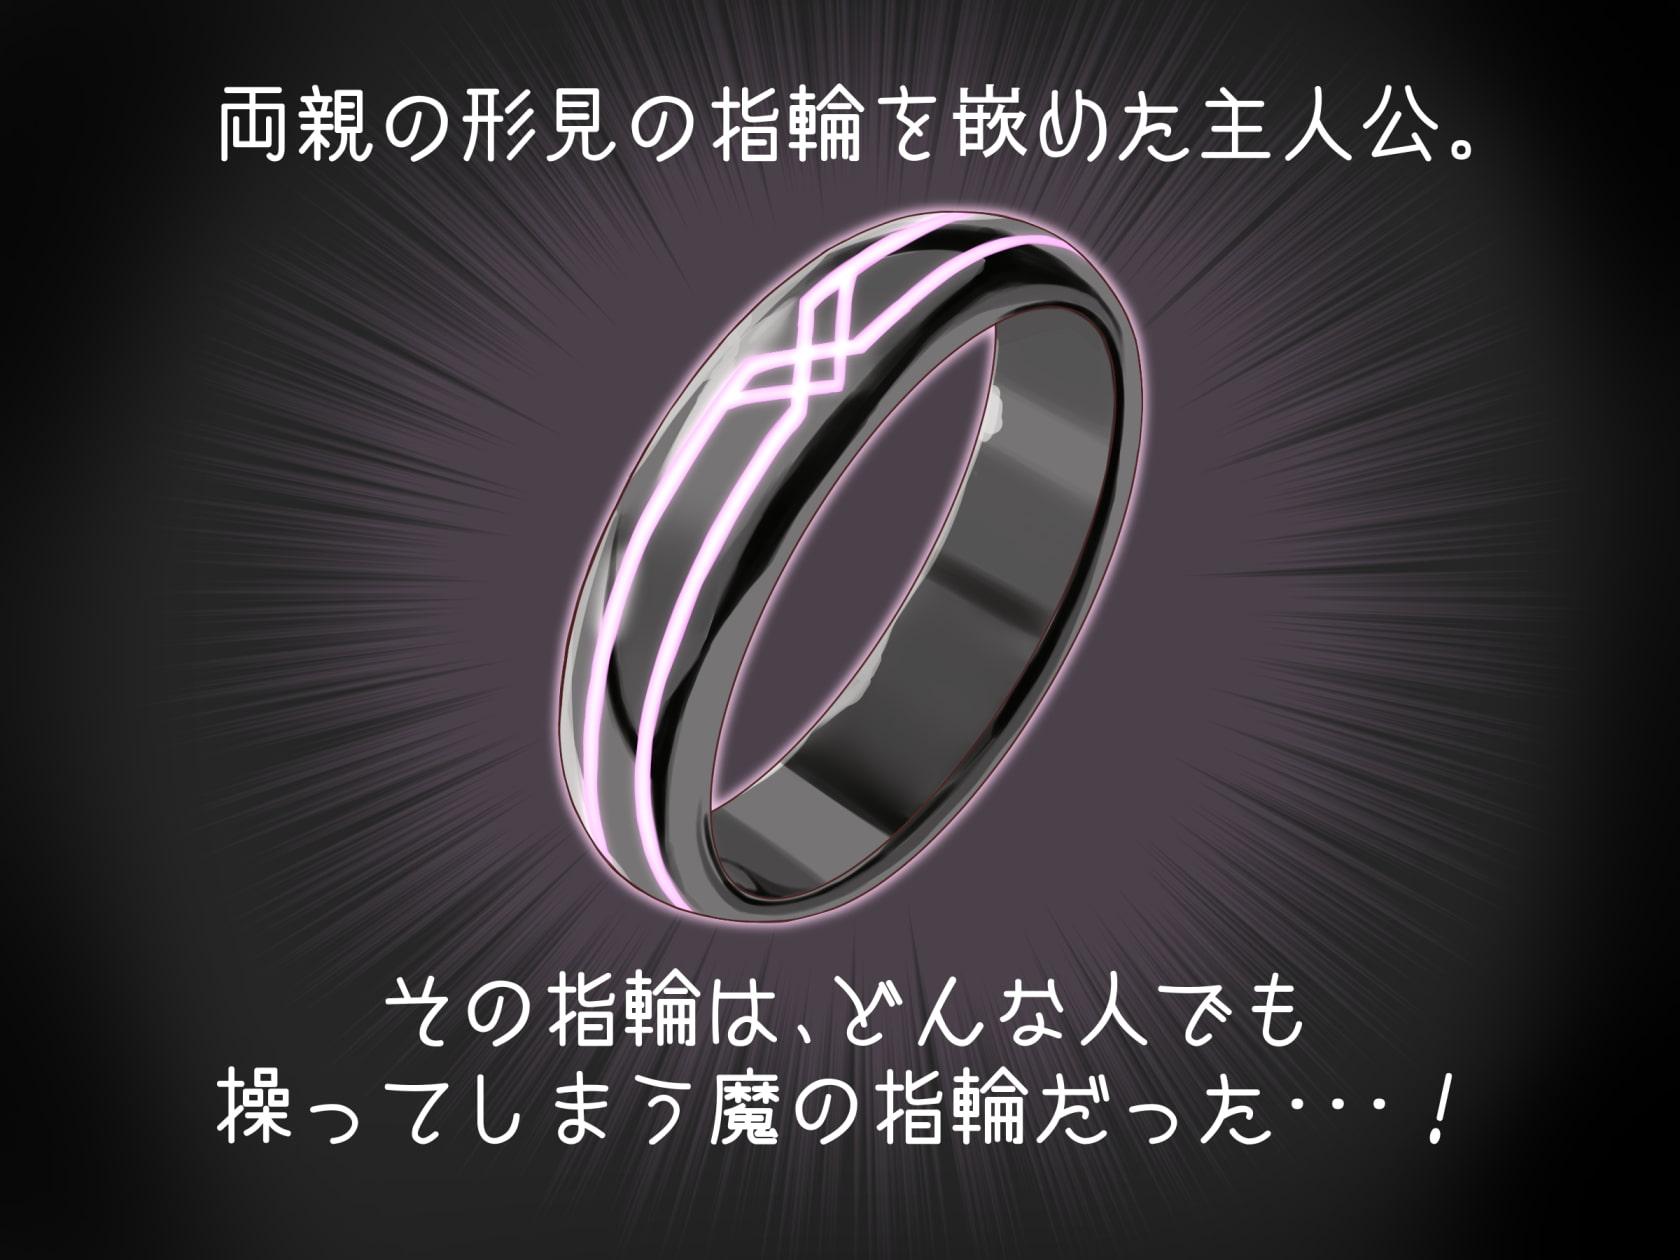 RJ342566 母娘快楽催淫~性なる指輪で高木家完堕ち~ [20211007]